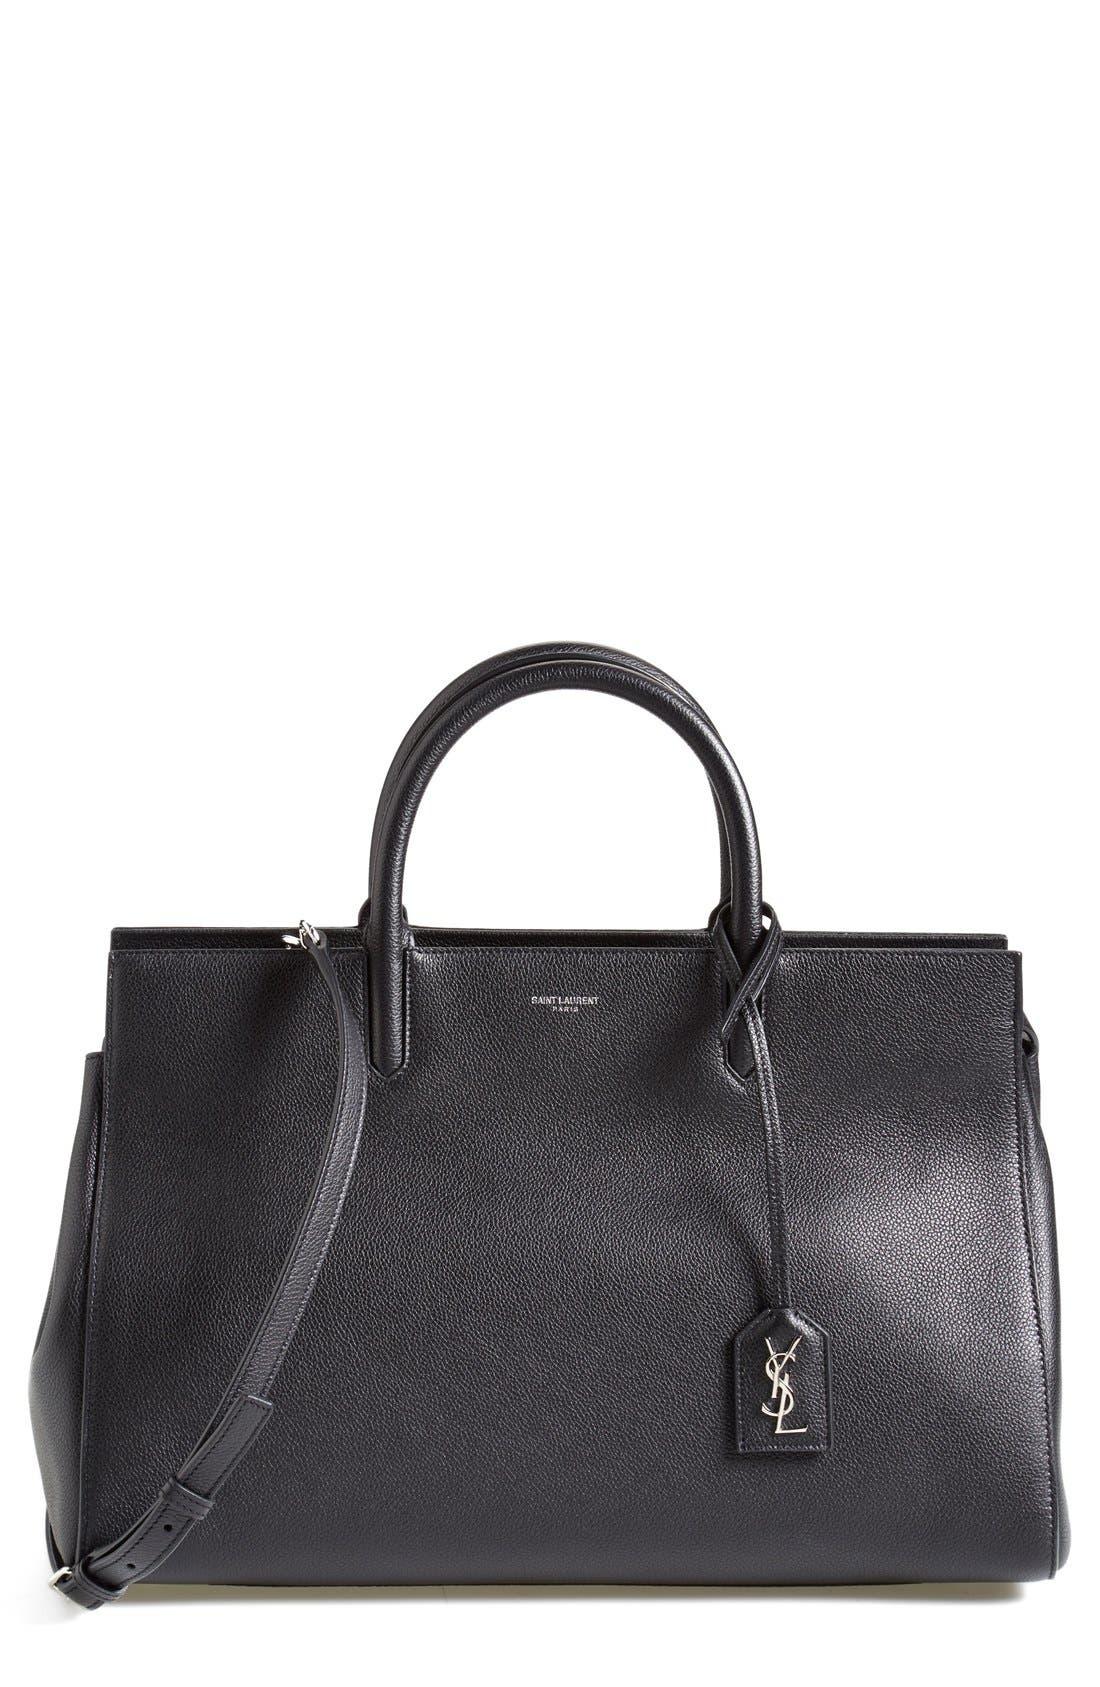 SAINT LAURENT 'Medium Cabas Rive Gauche' Grained Leather